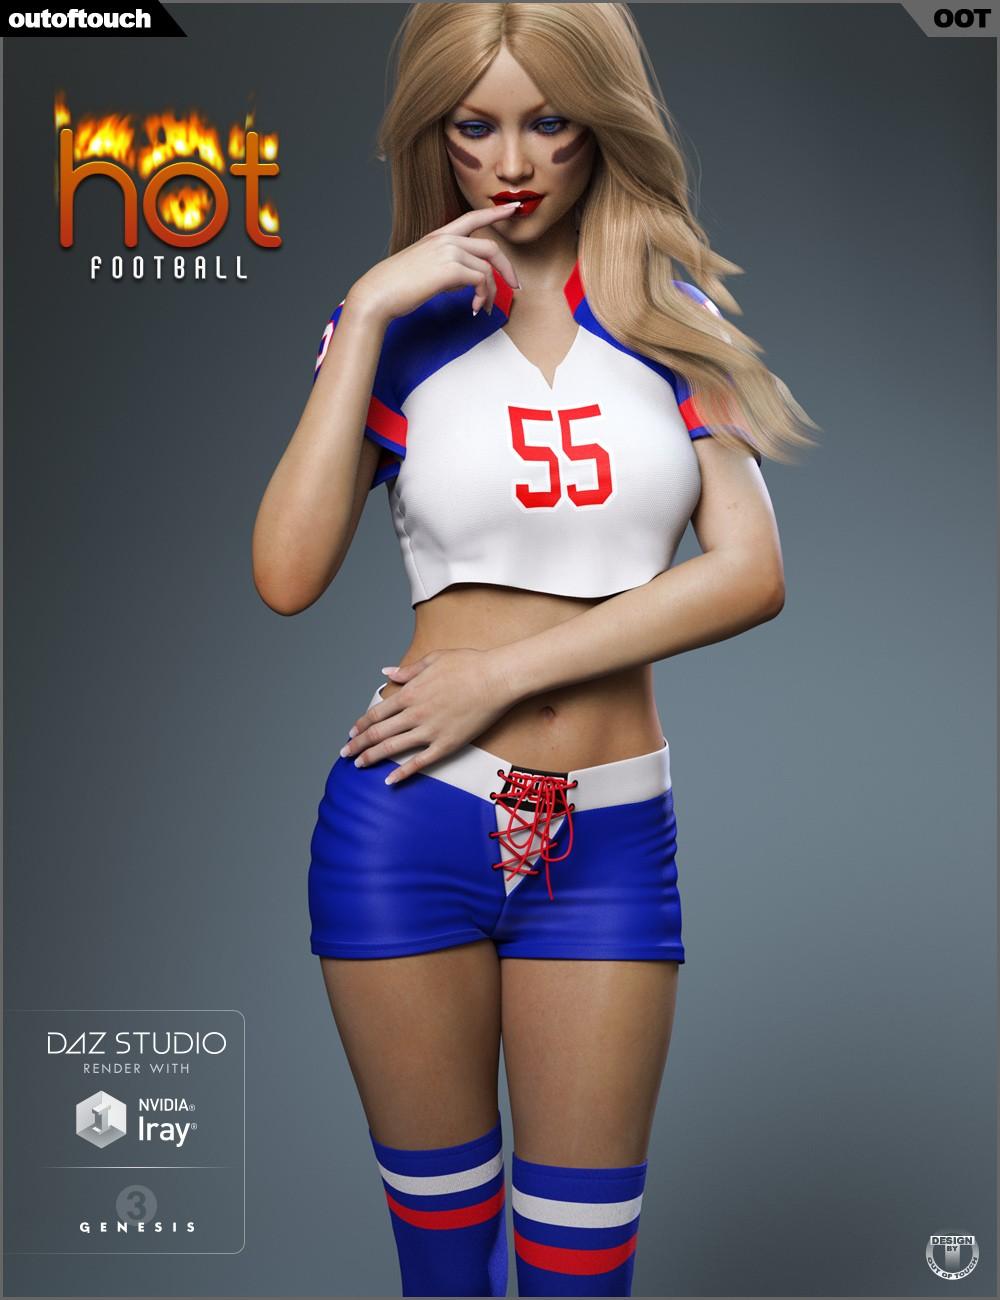 Download Daz Studio 3 For Free Daz 3D - Hot Football -1047